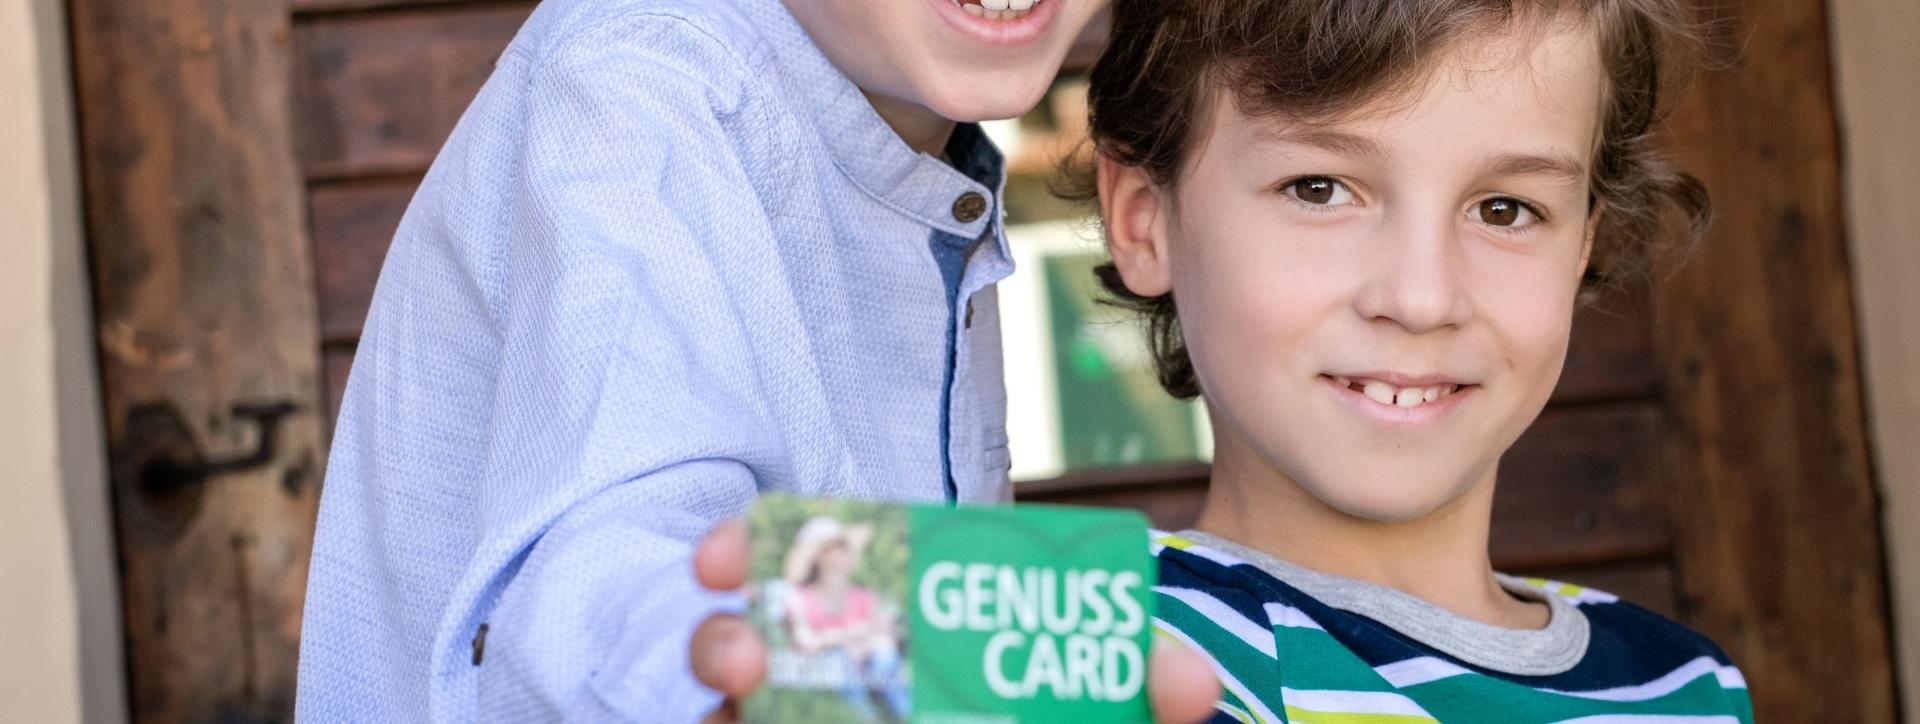 Ausflugsziel GenussCard (